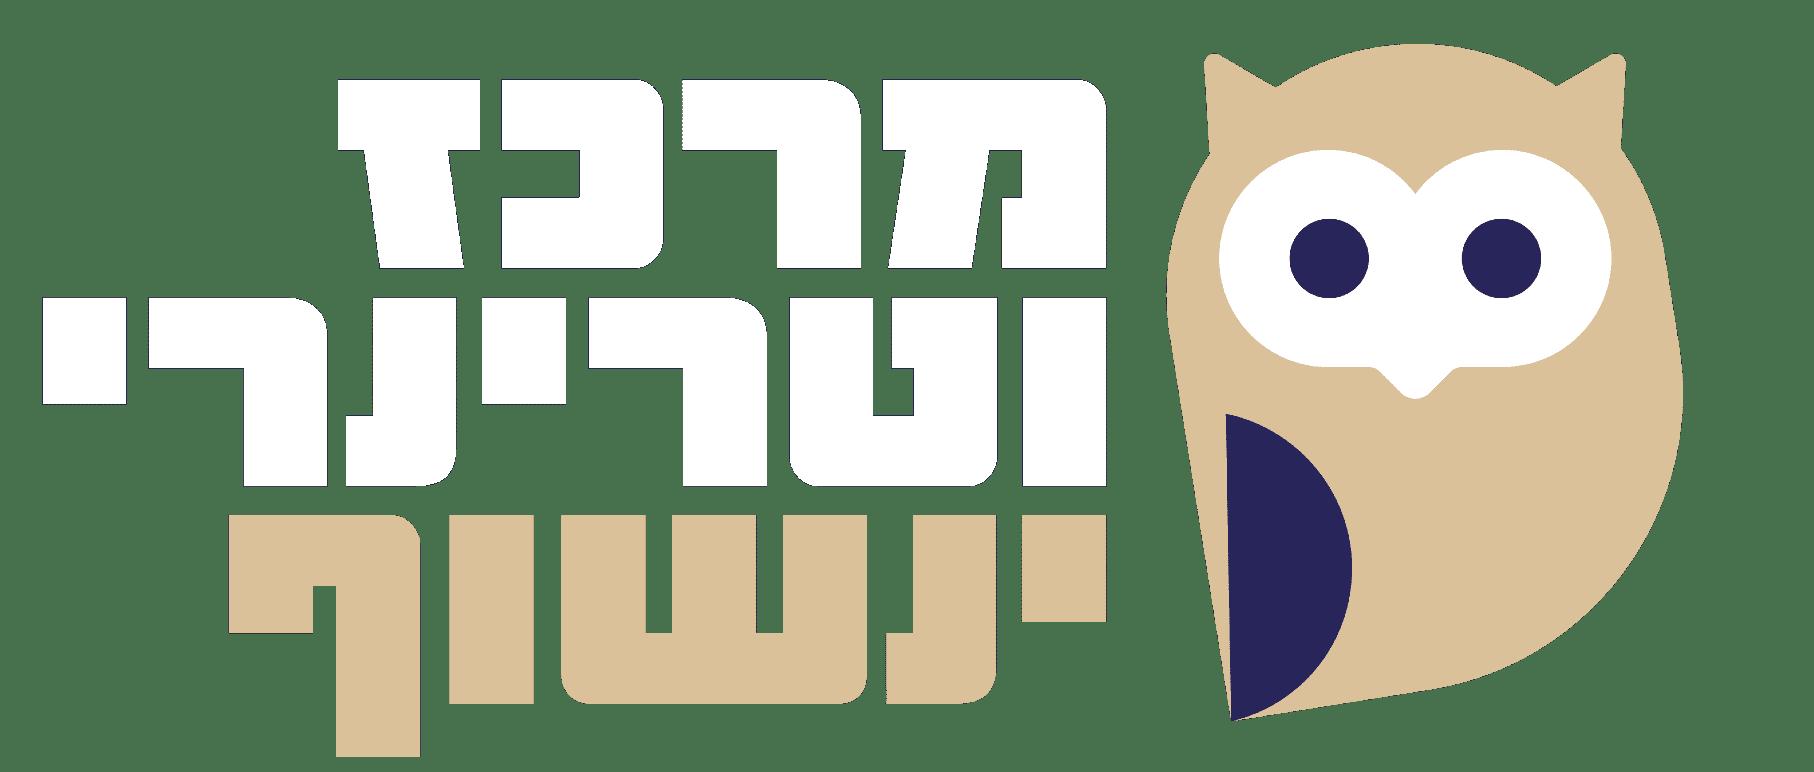 owlvet – מרפאה וטרינרית בהרצליה 24/7